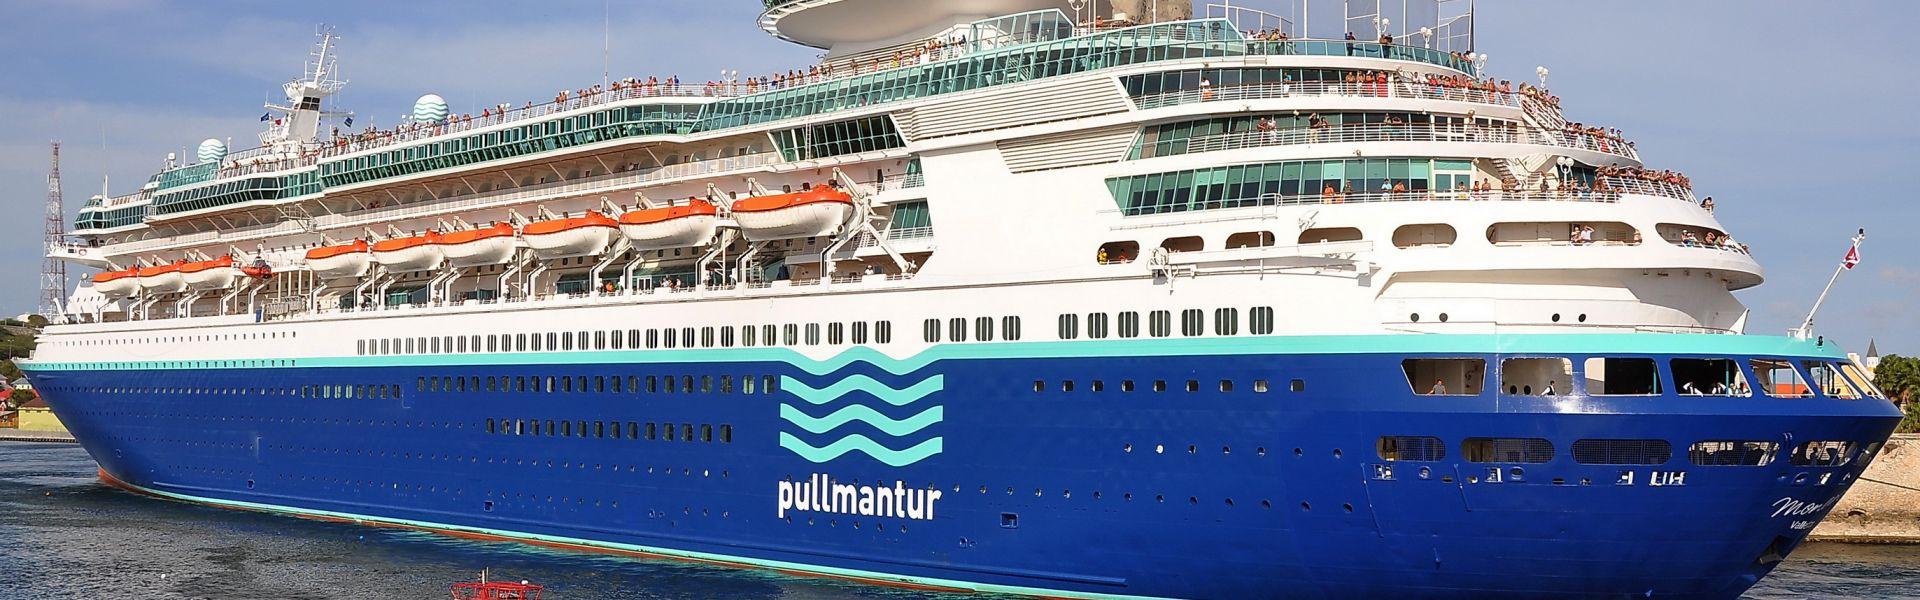 Croaziera 2017 - Capitale Baltice (Rostock) - Pullmantur Cruises - Monarch -  7 nopti